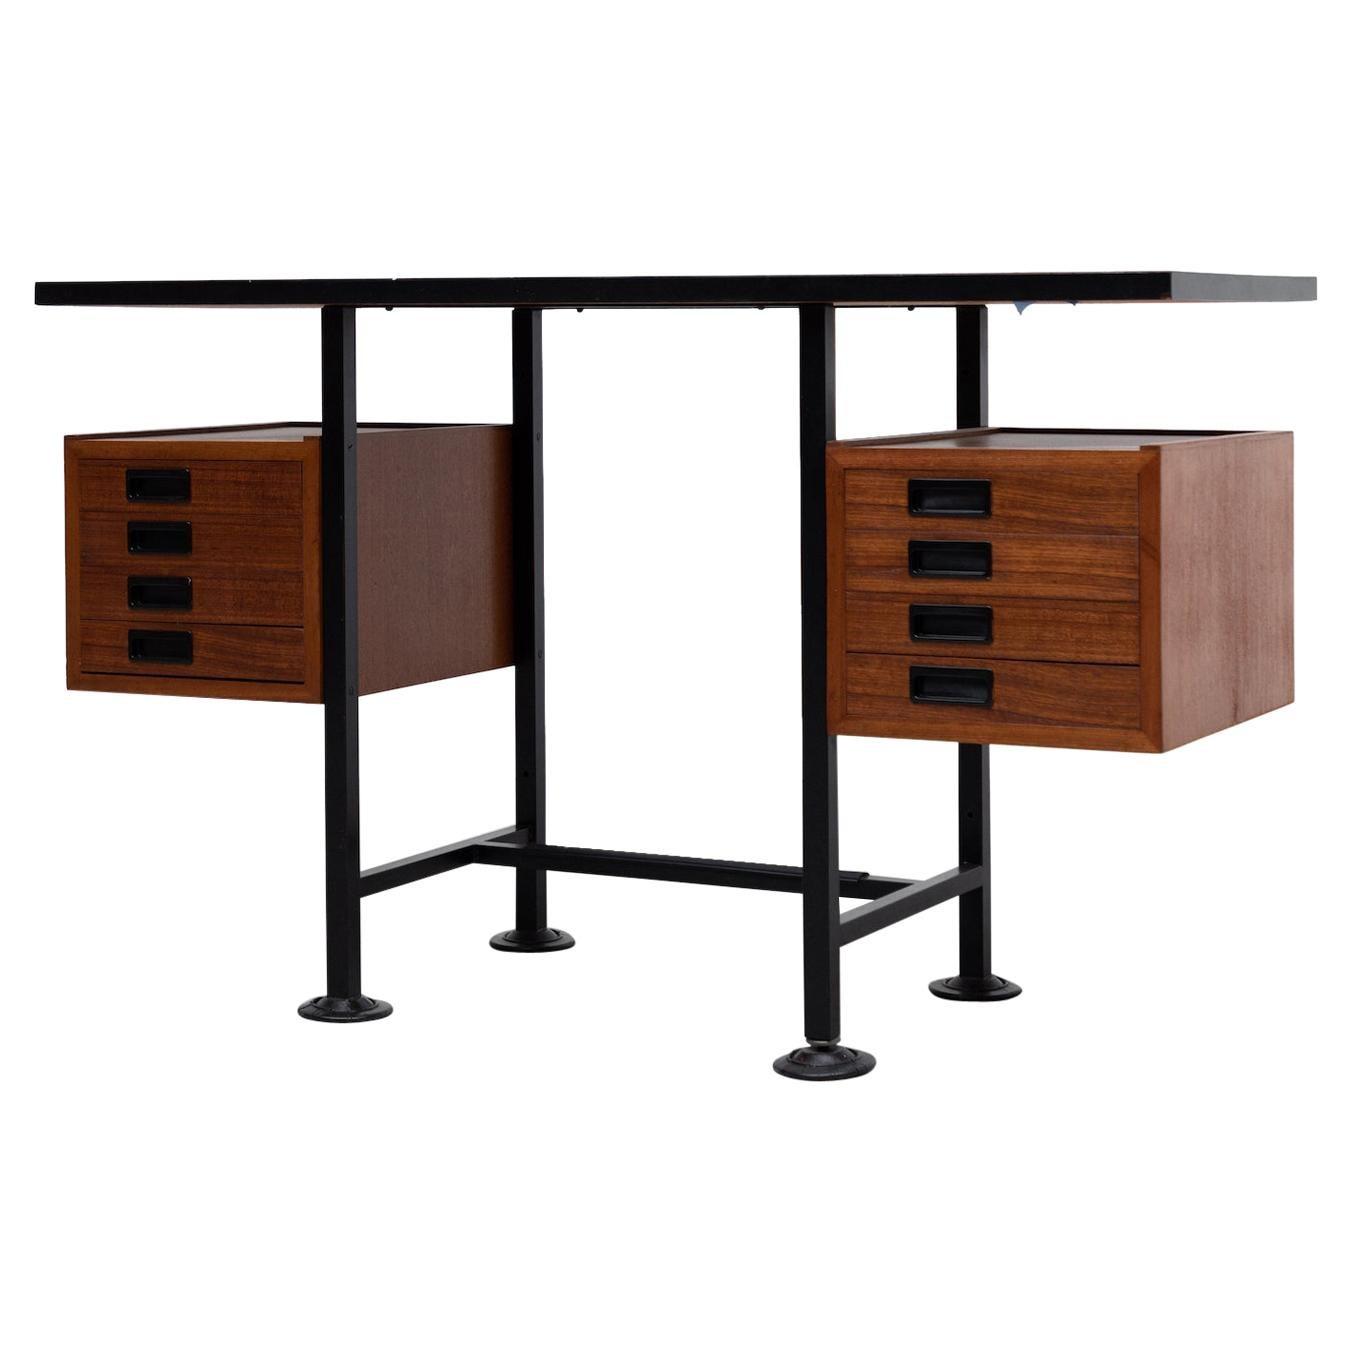 Ico Parisi Inspired Modernest Desk or Vanity